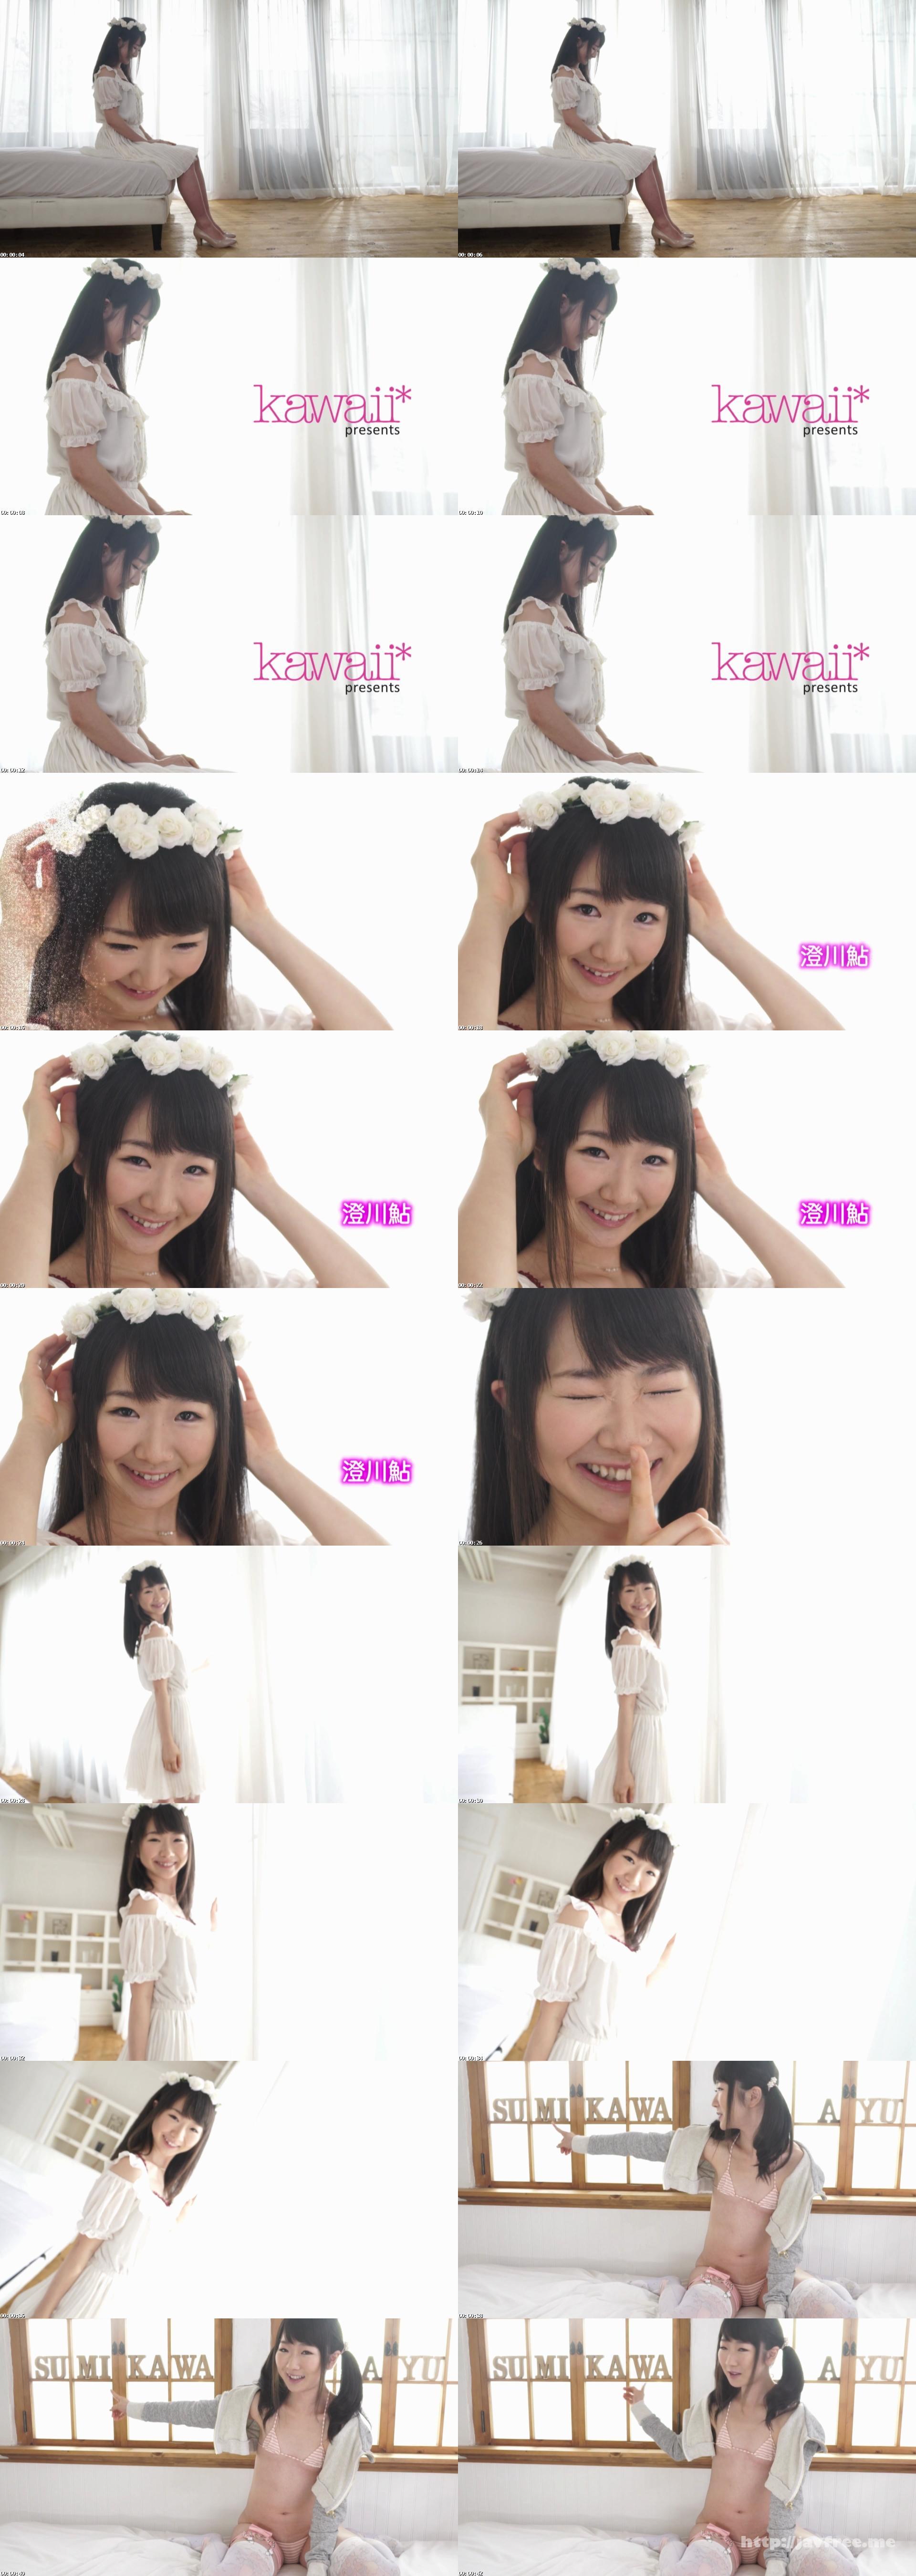 [KAWD-770] 新人!kawaii*専属 超敏感チクビのAAカップ激スリムぺったんこ美少女 澄川鮎 AVデビュー